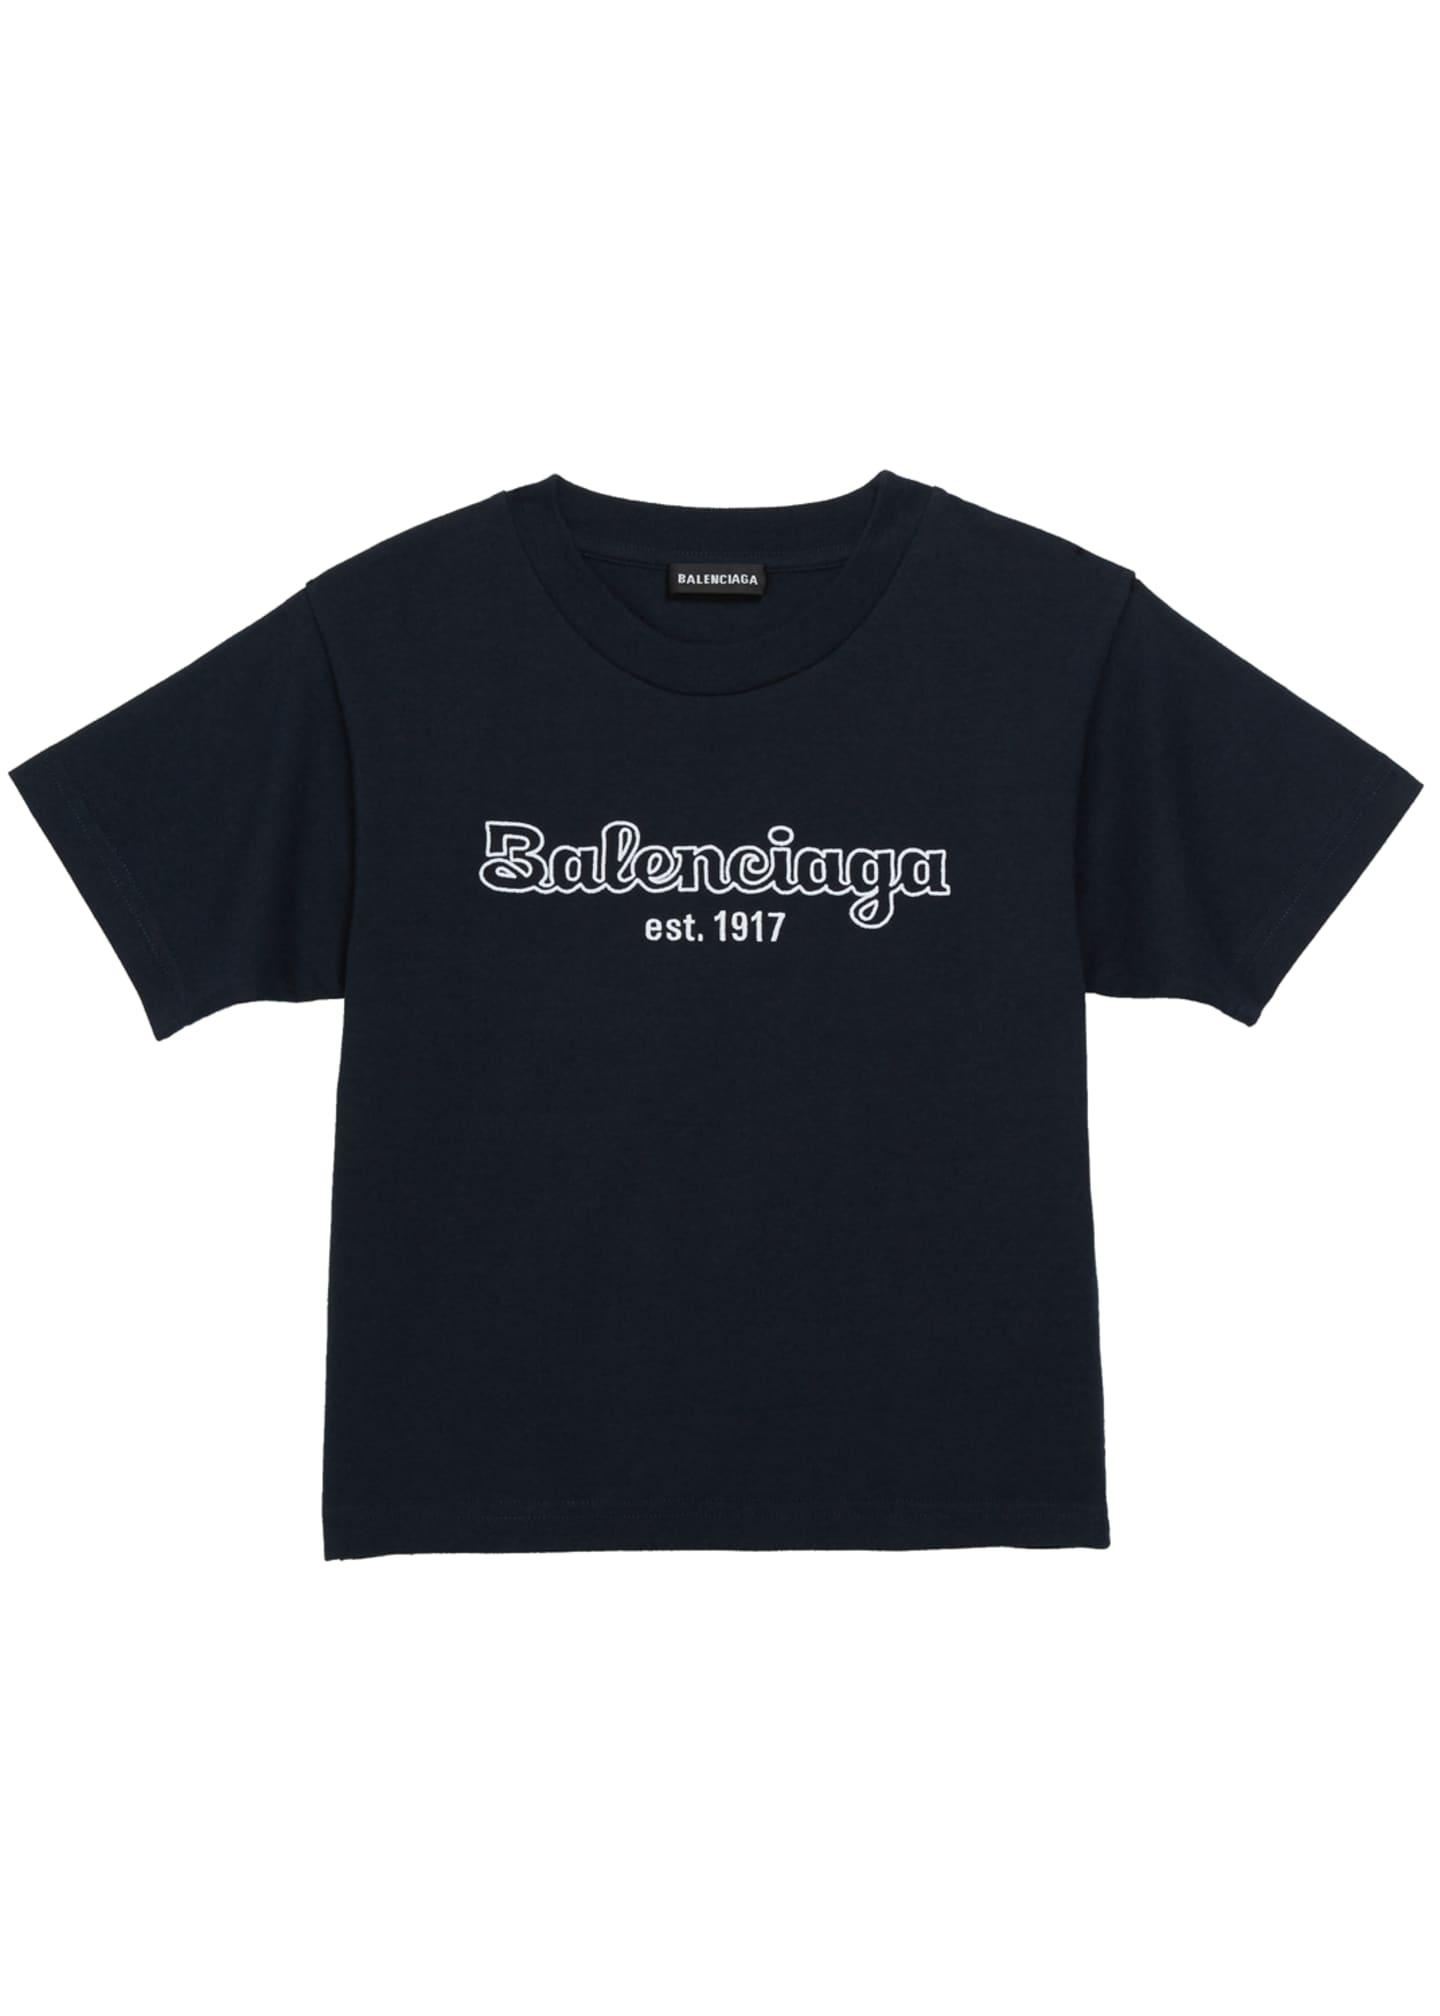 Balenciaga Kid's Bubble Script Logo Short-Sleeve T-Shirt, Size